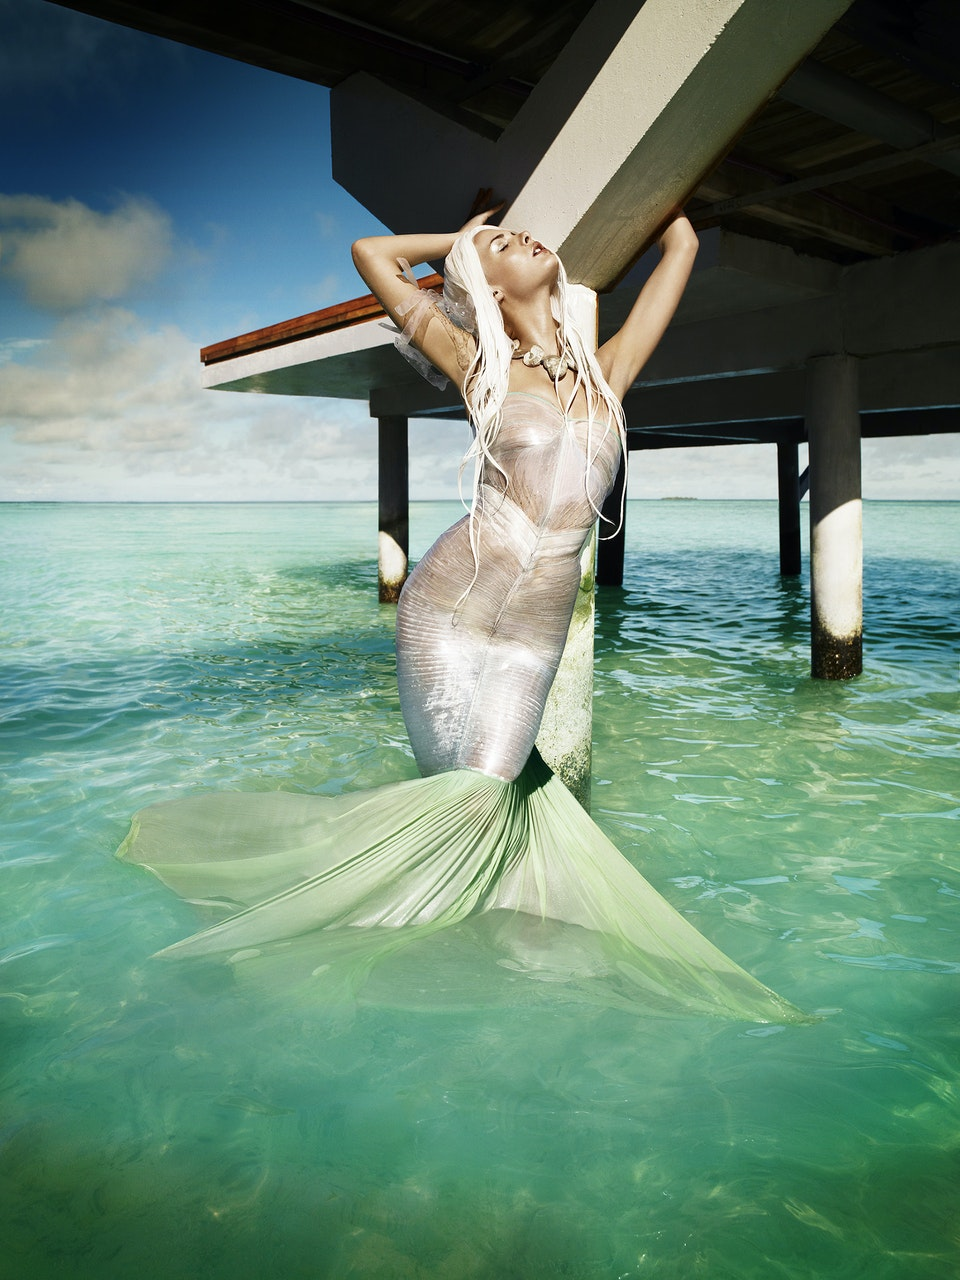 Vogue India Mermaid Story